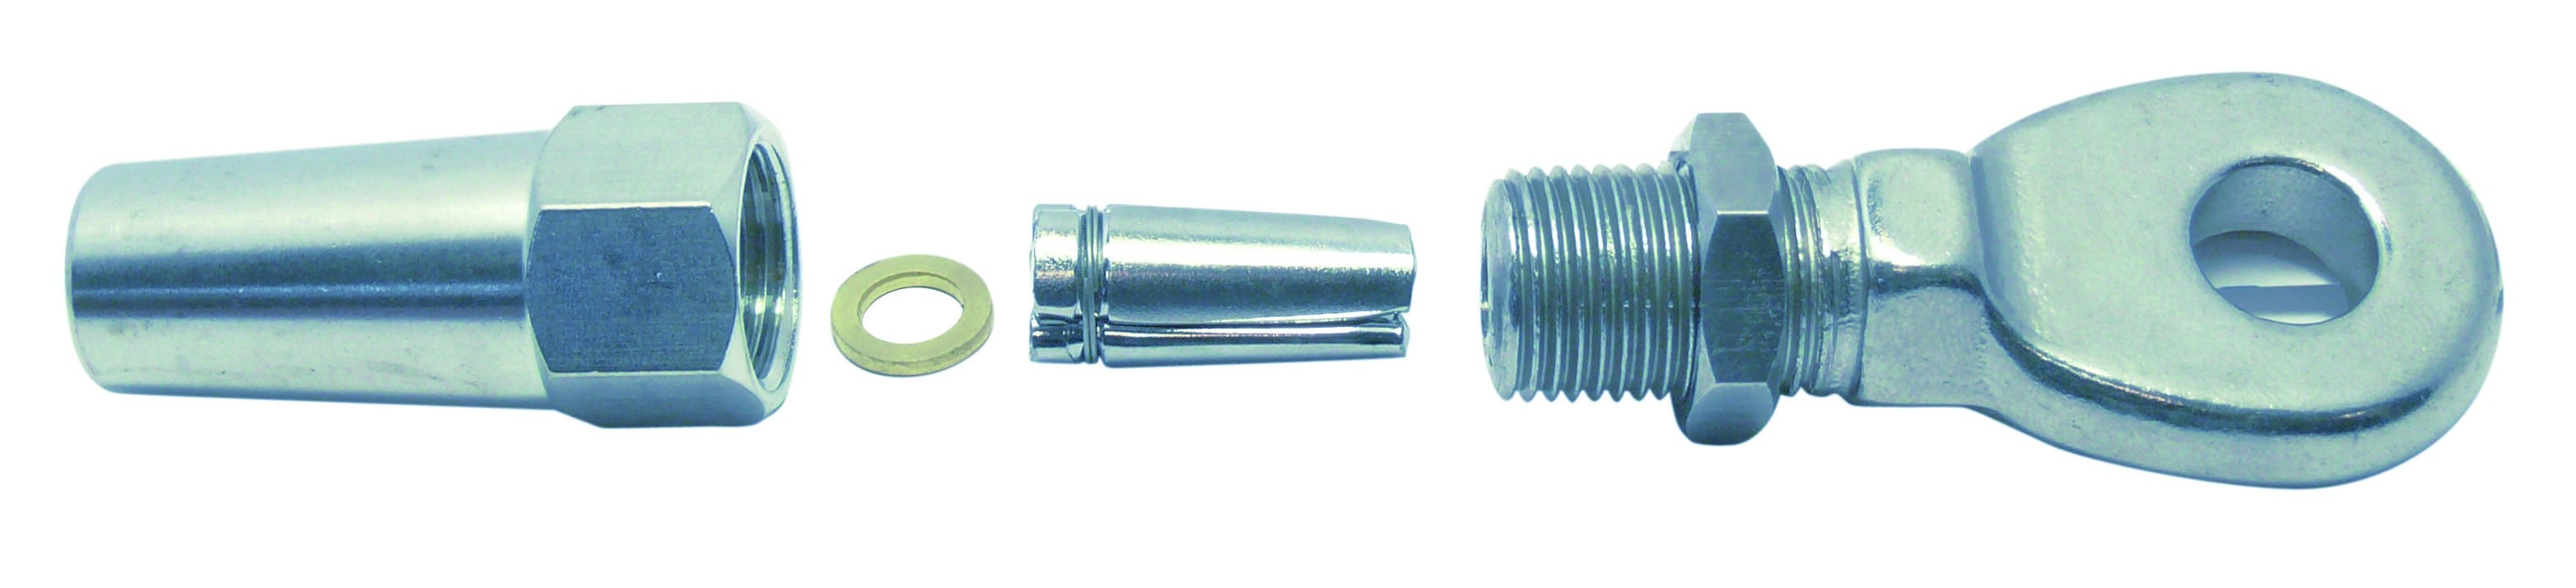 DHZ-oogterminal 5mm RVS A4 1 stuks